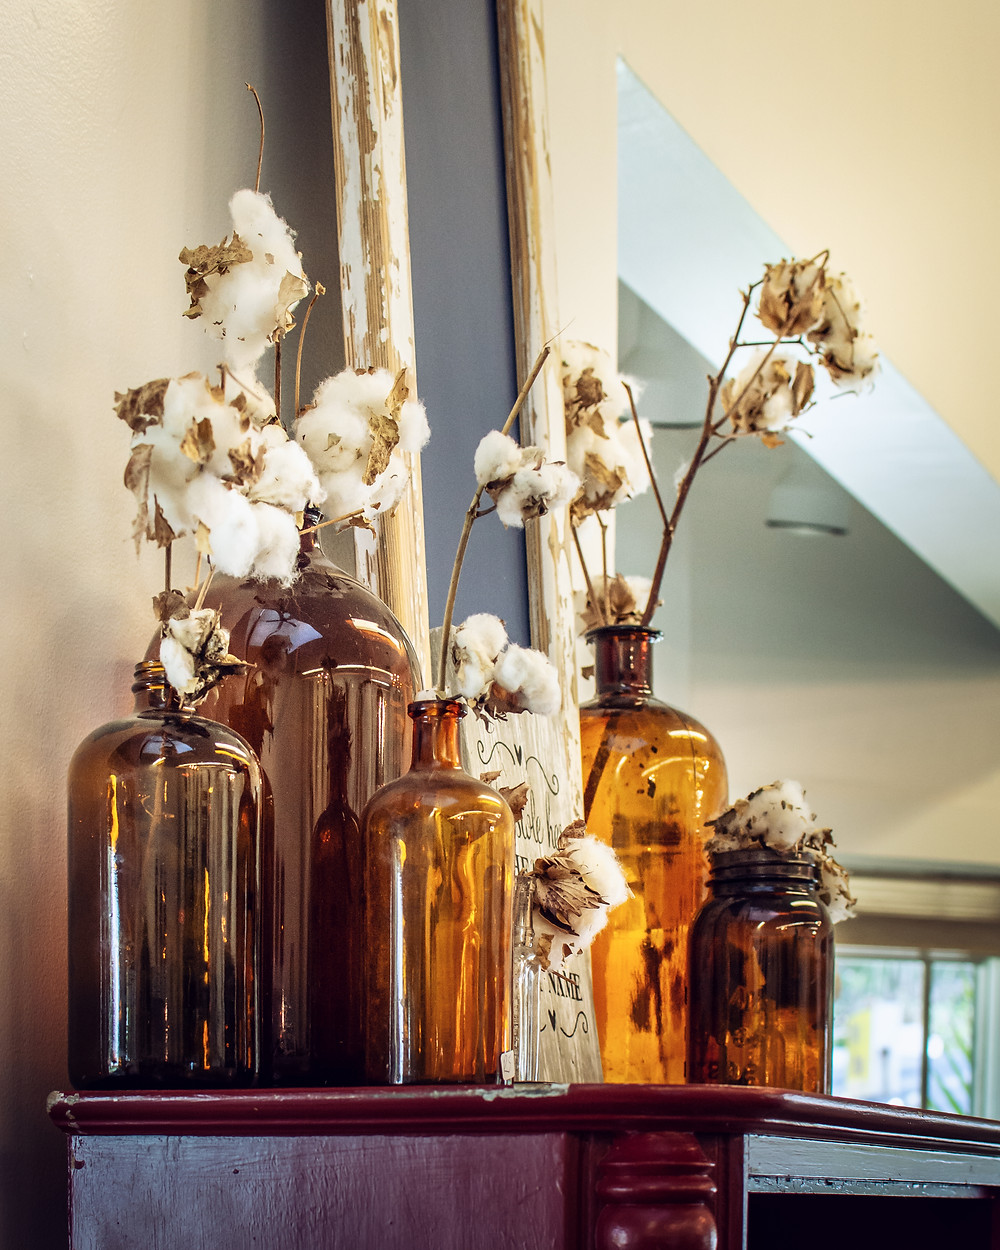 Vintage bottle centerpieces, Growler Centerpieces, Beer Bottle Bud Vases